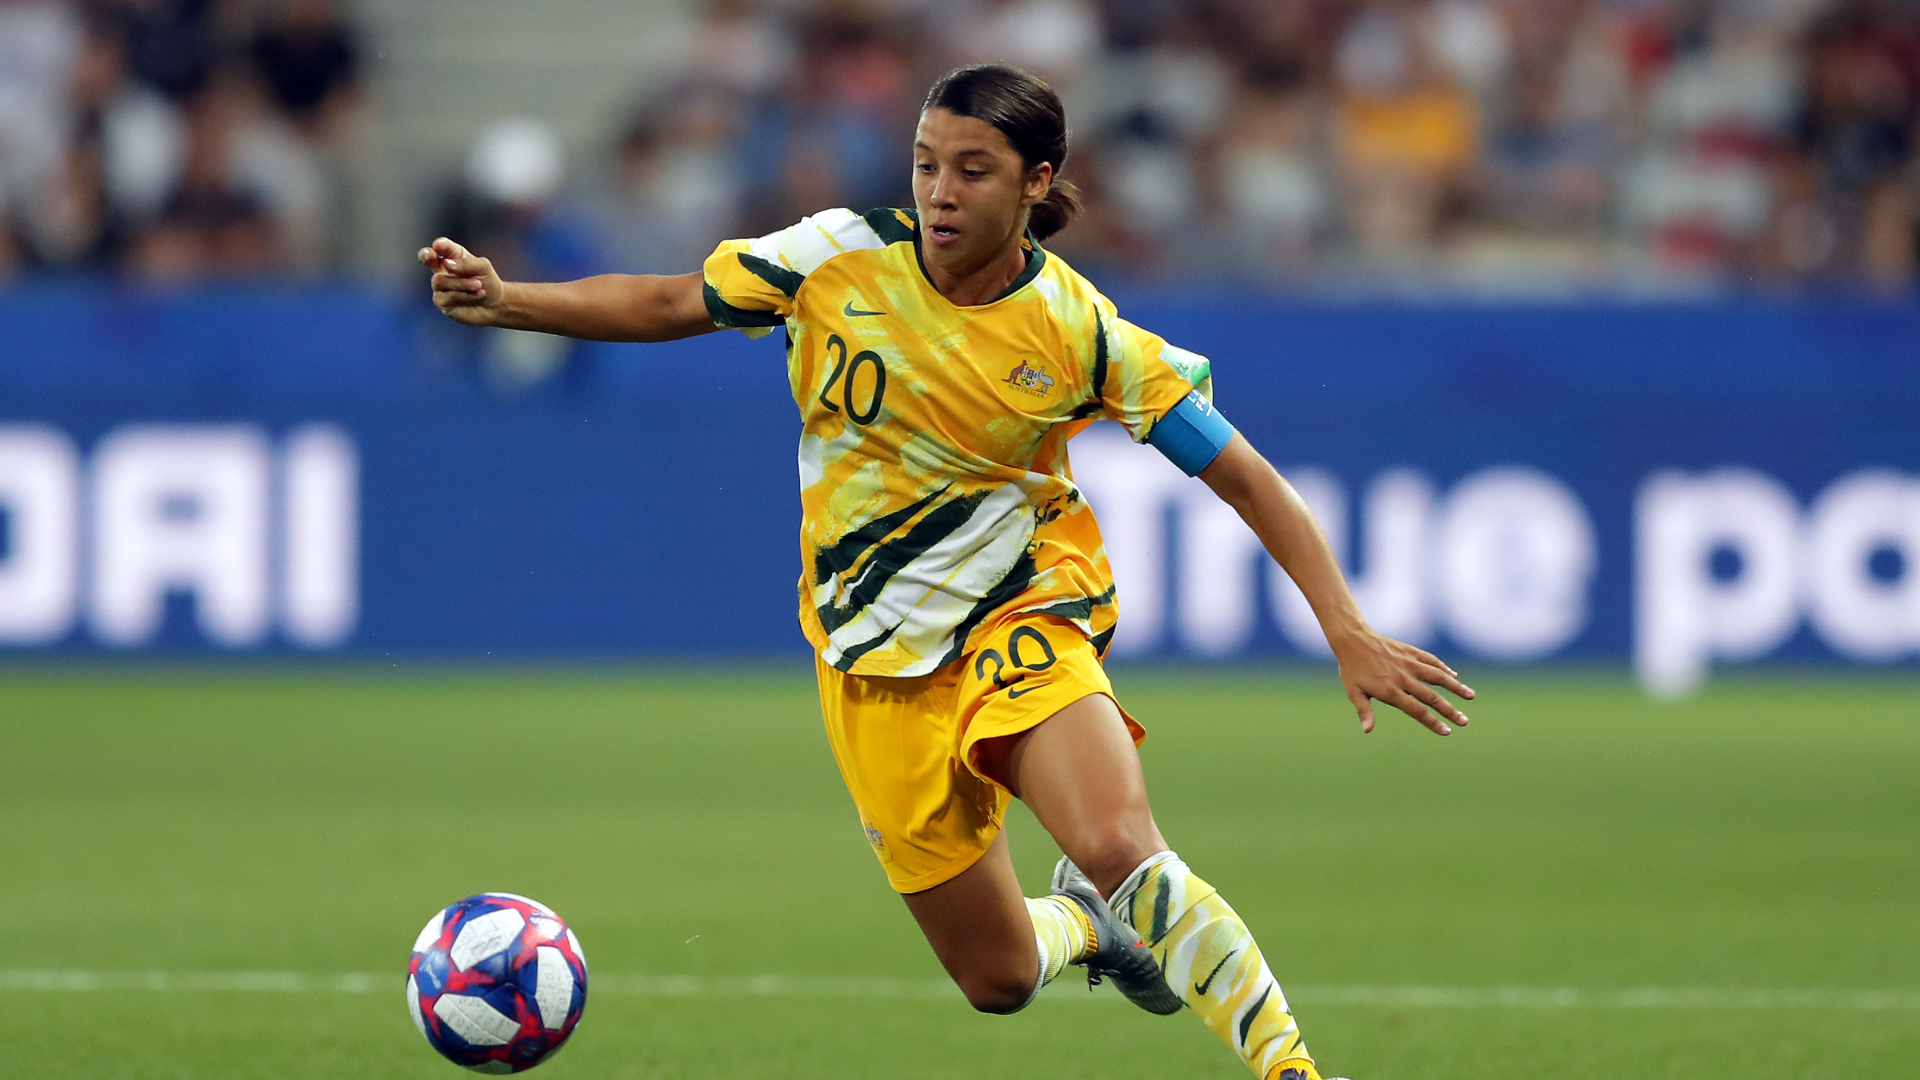 A-League and Australian football news LIVE: Matildas qualify for 2020 Olympics